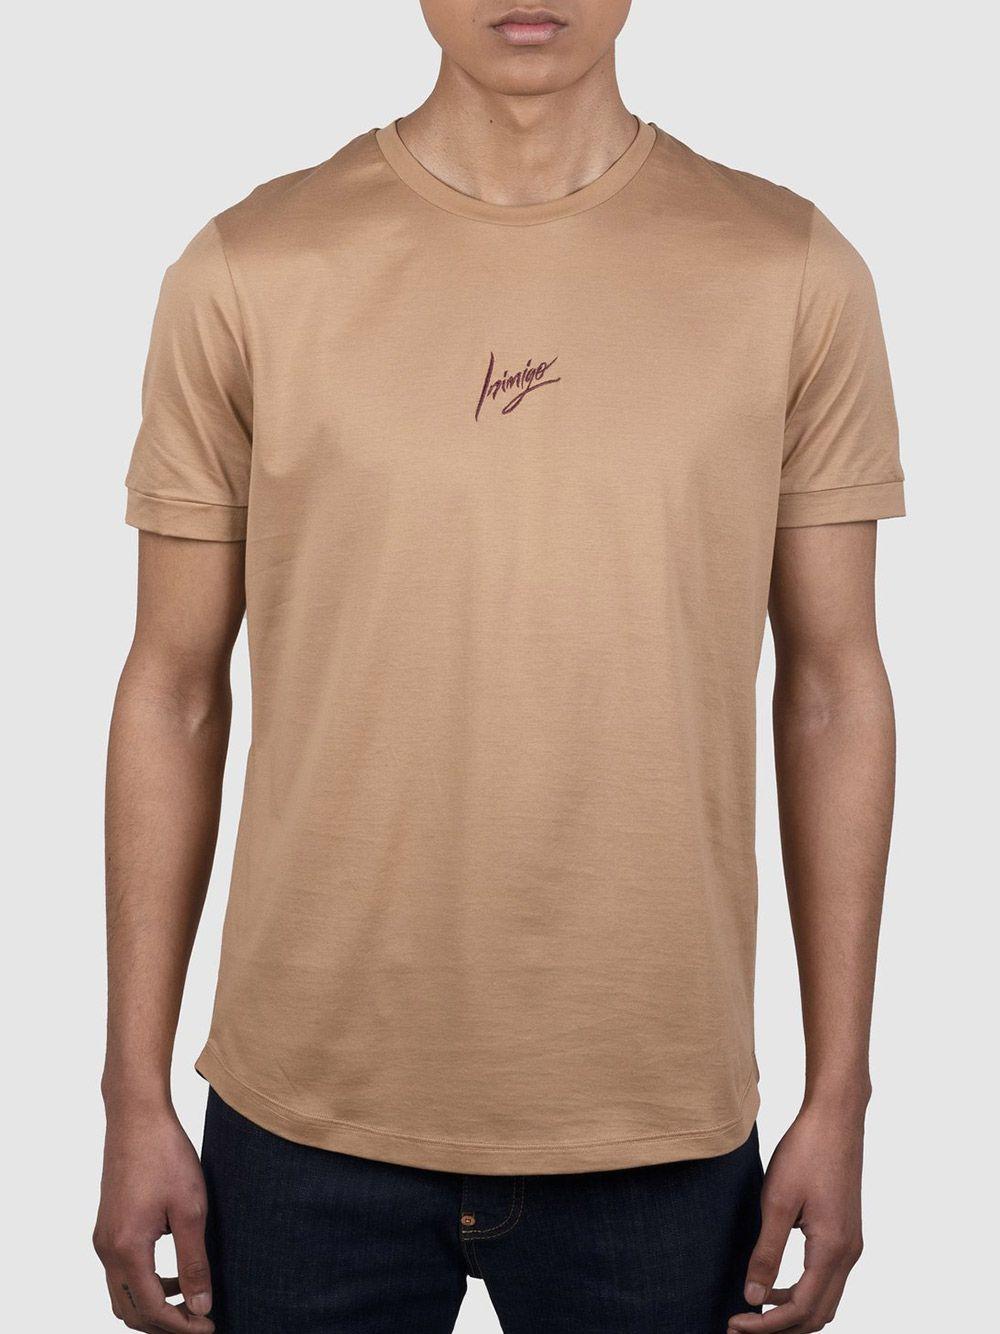 T-shirt Bege Rockstar